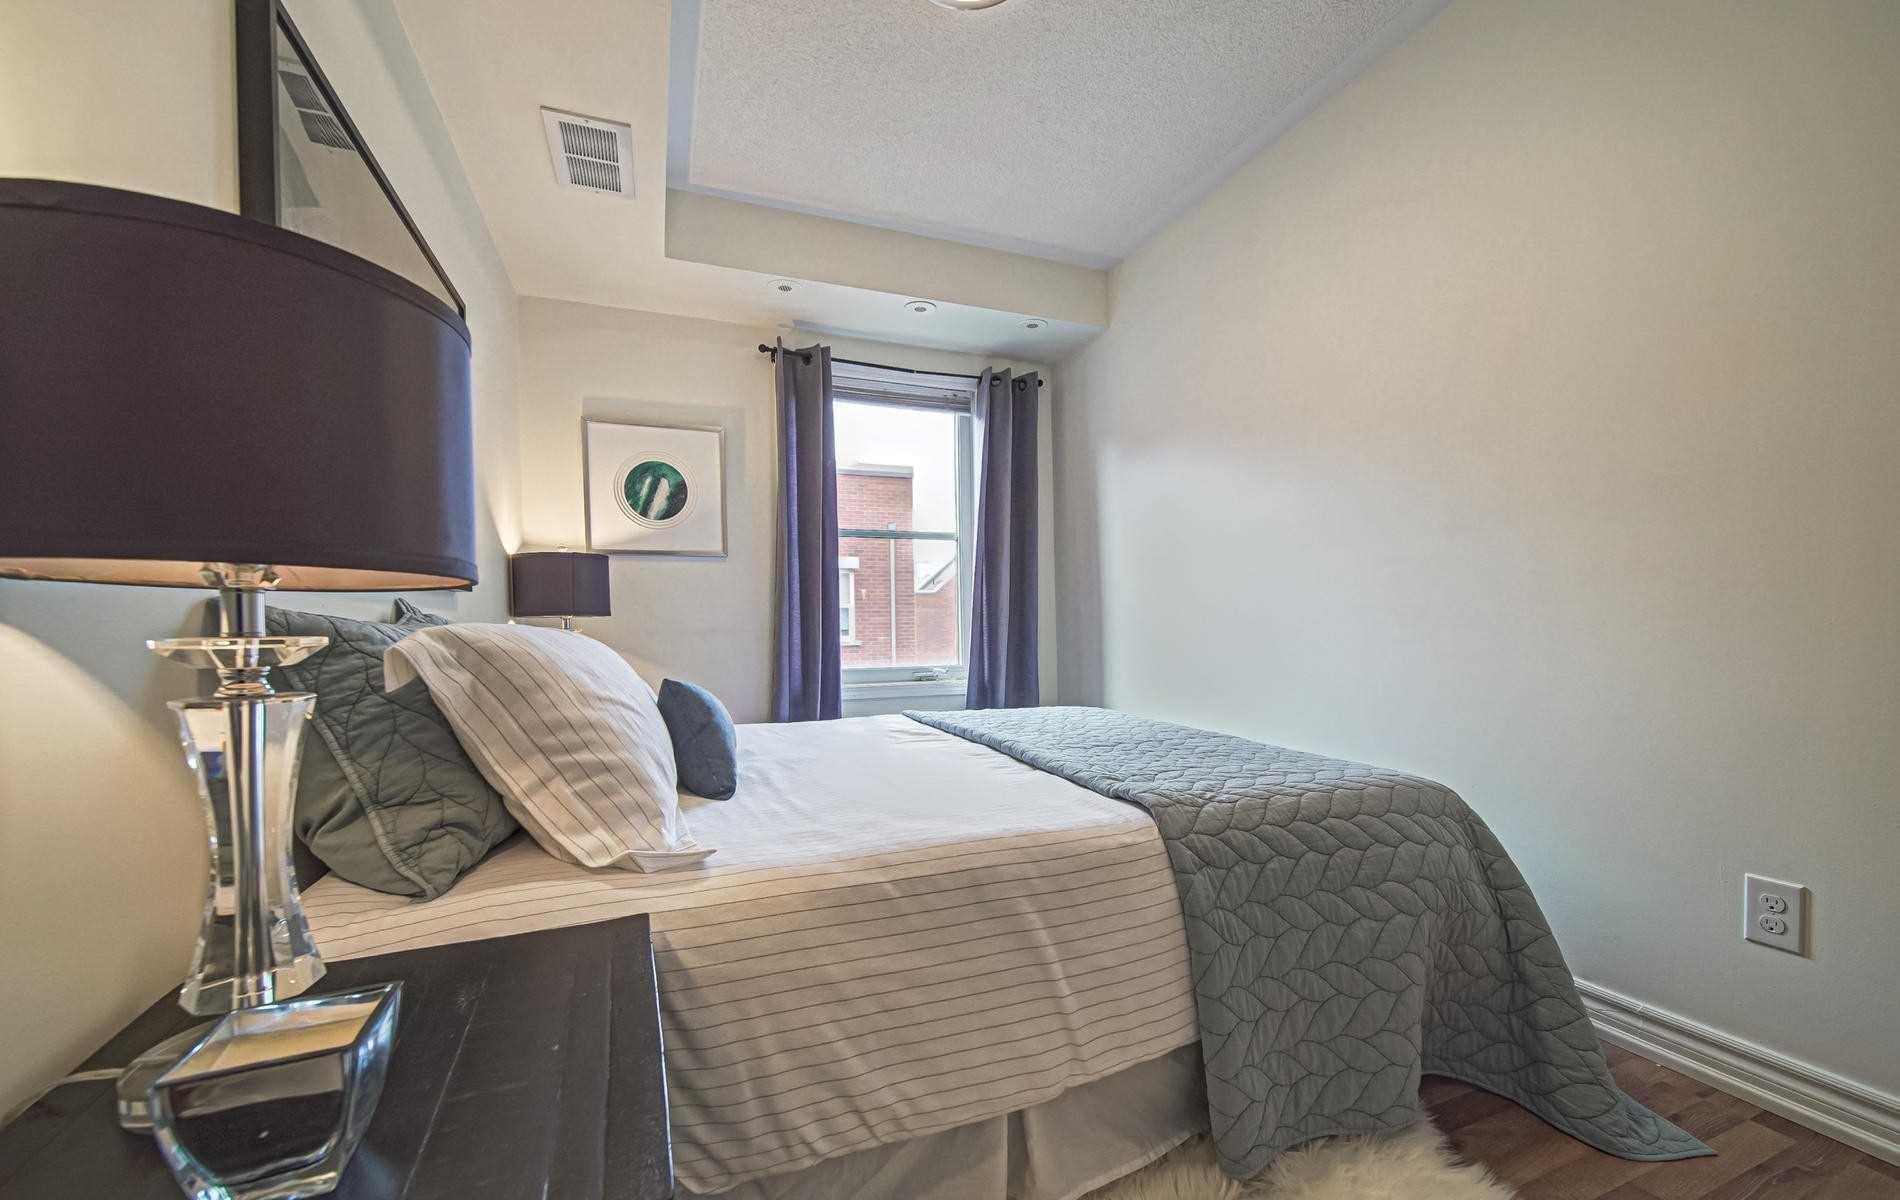 Photo 10: Photos: 3 78 Munro Street in Toronto: South Riverdale Condo for sale (Toronto E01)  : MLS®# E4615987